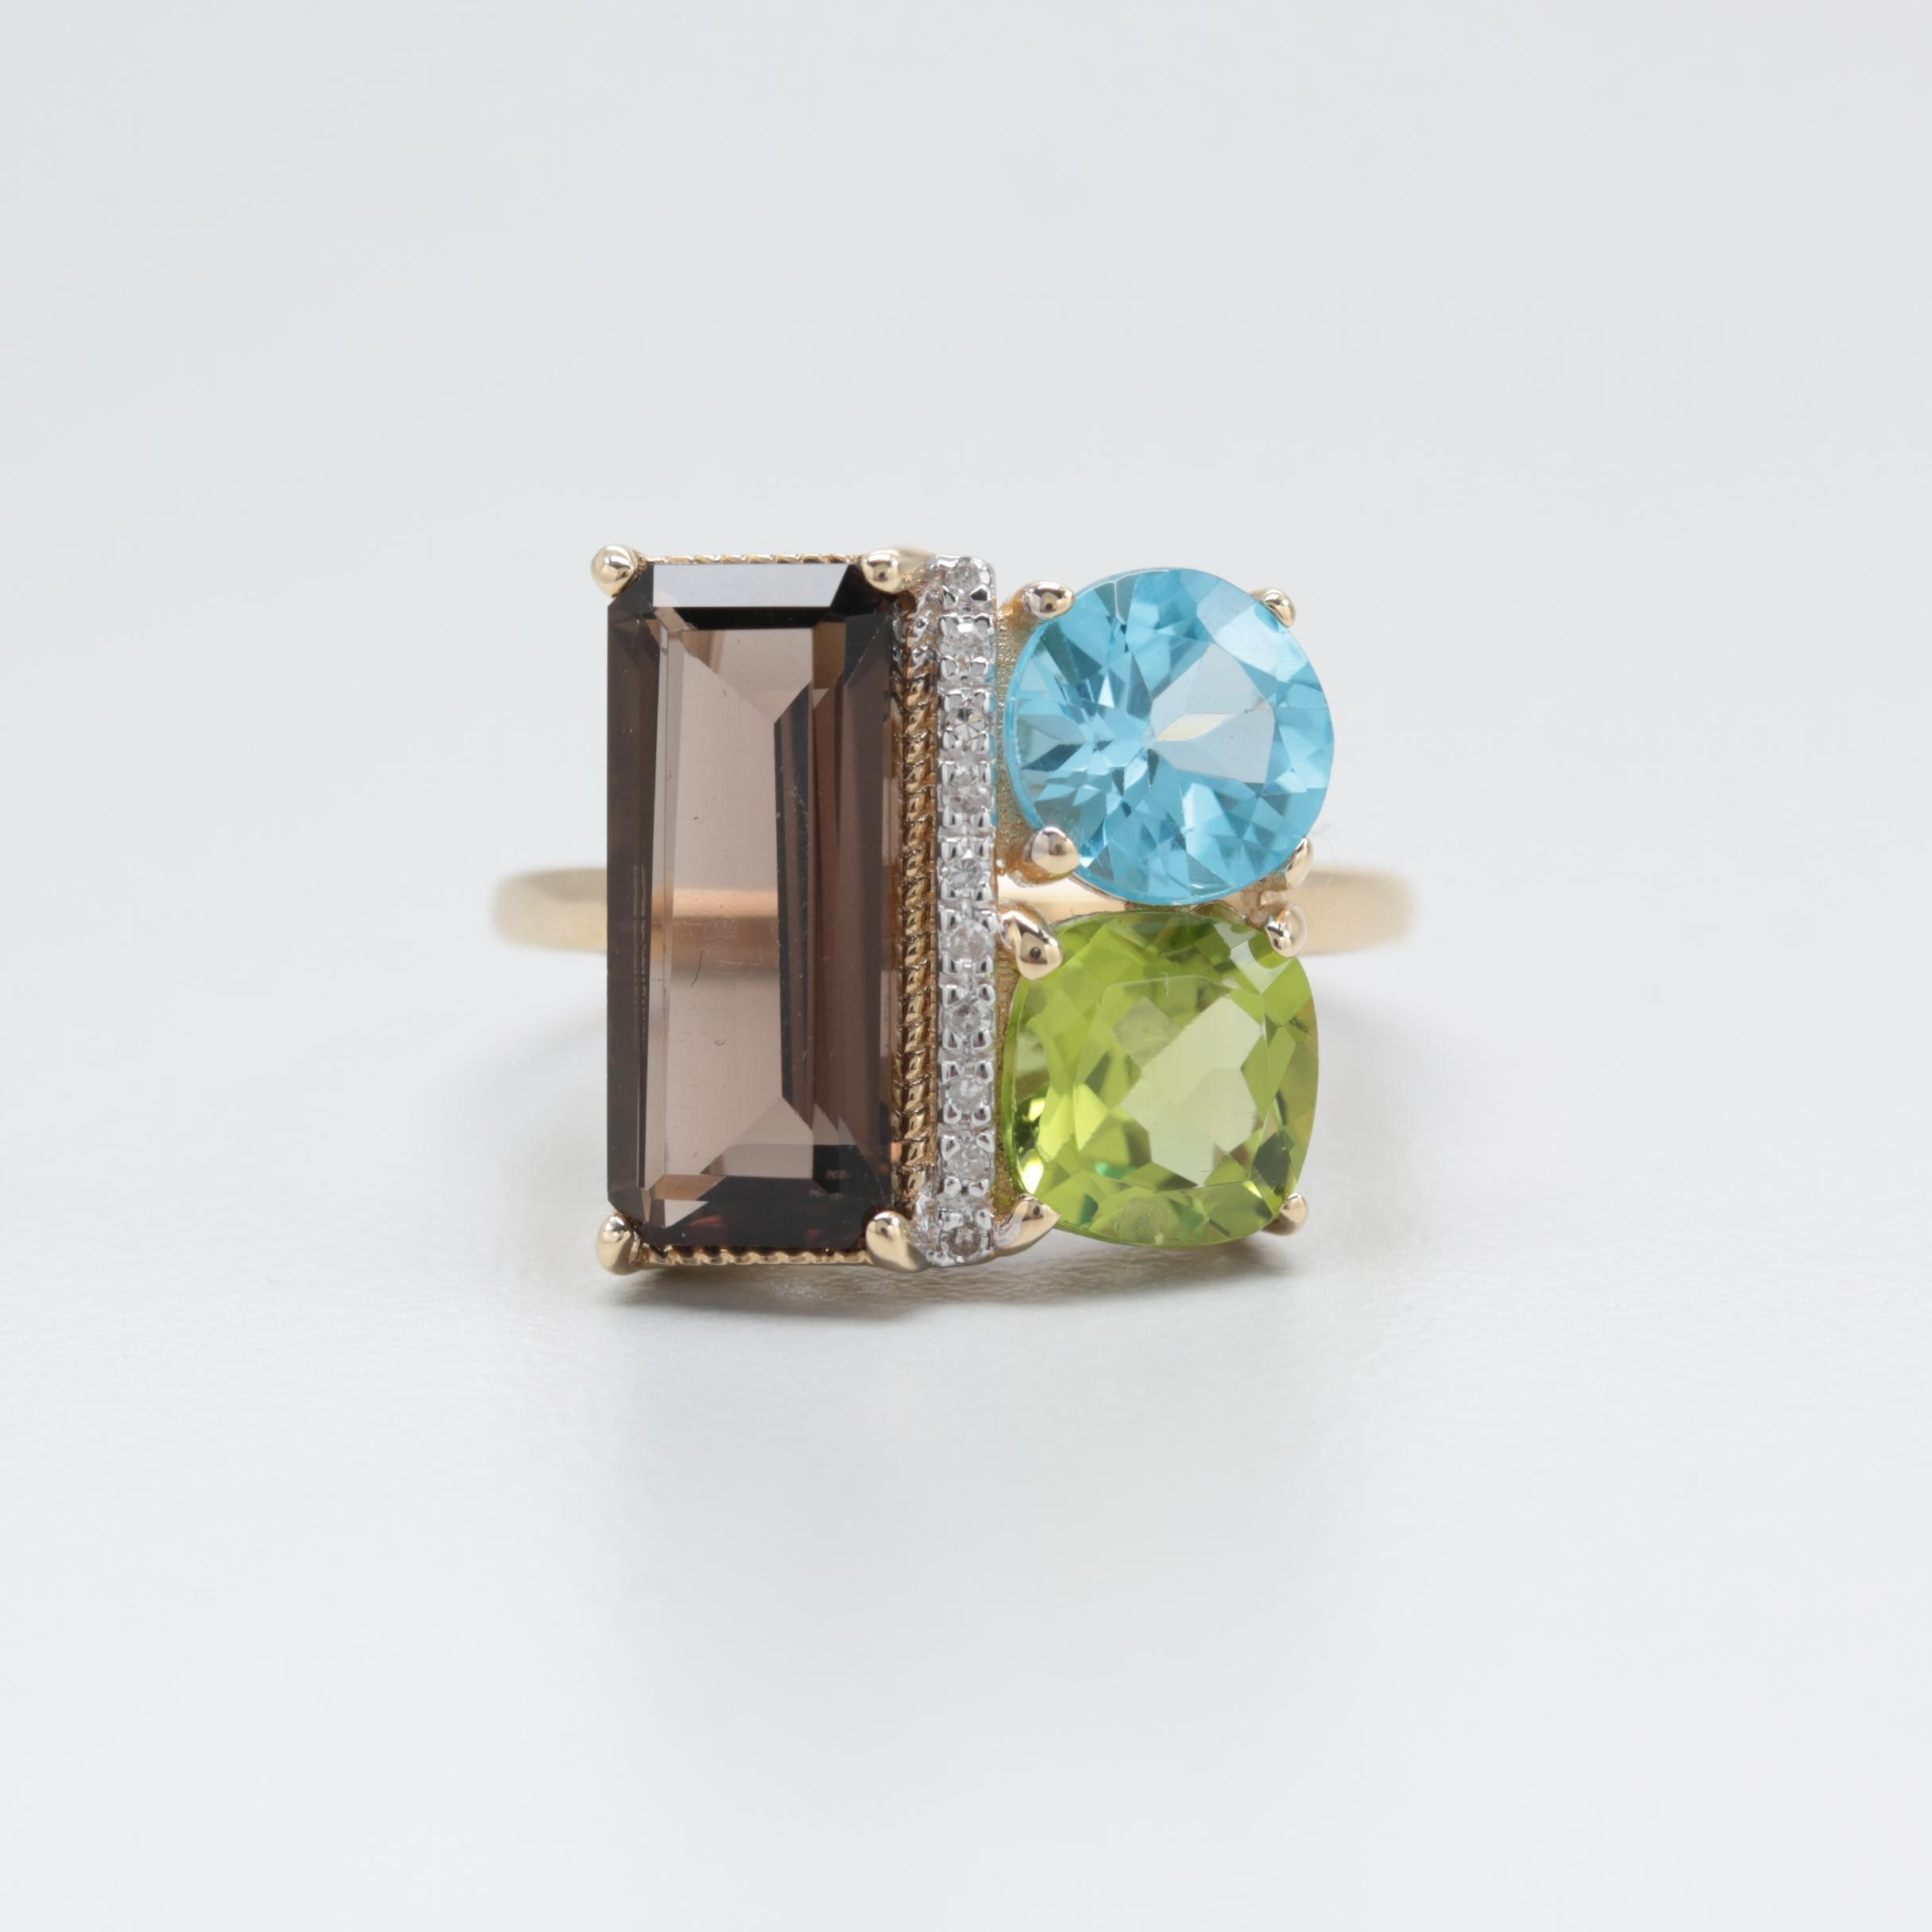 10K Yellow Gold Smoky Quartz, Blue Topaz, Peridot and Diamond Ring